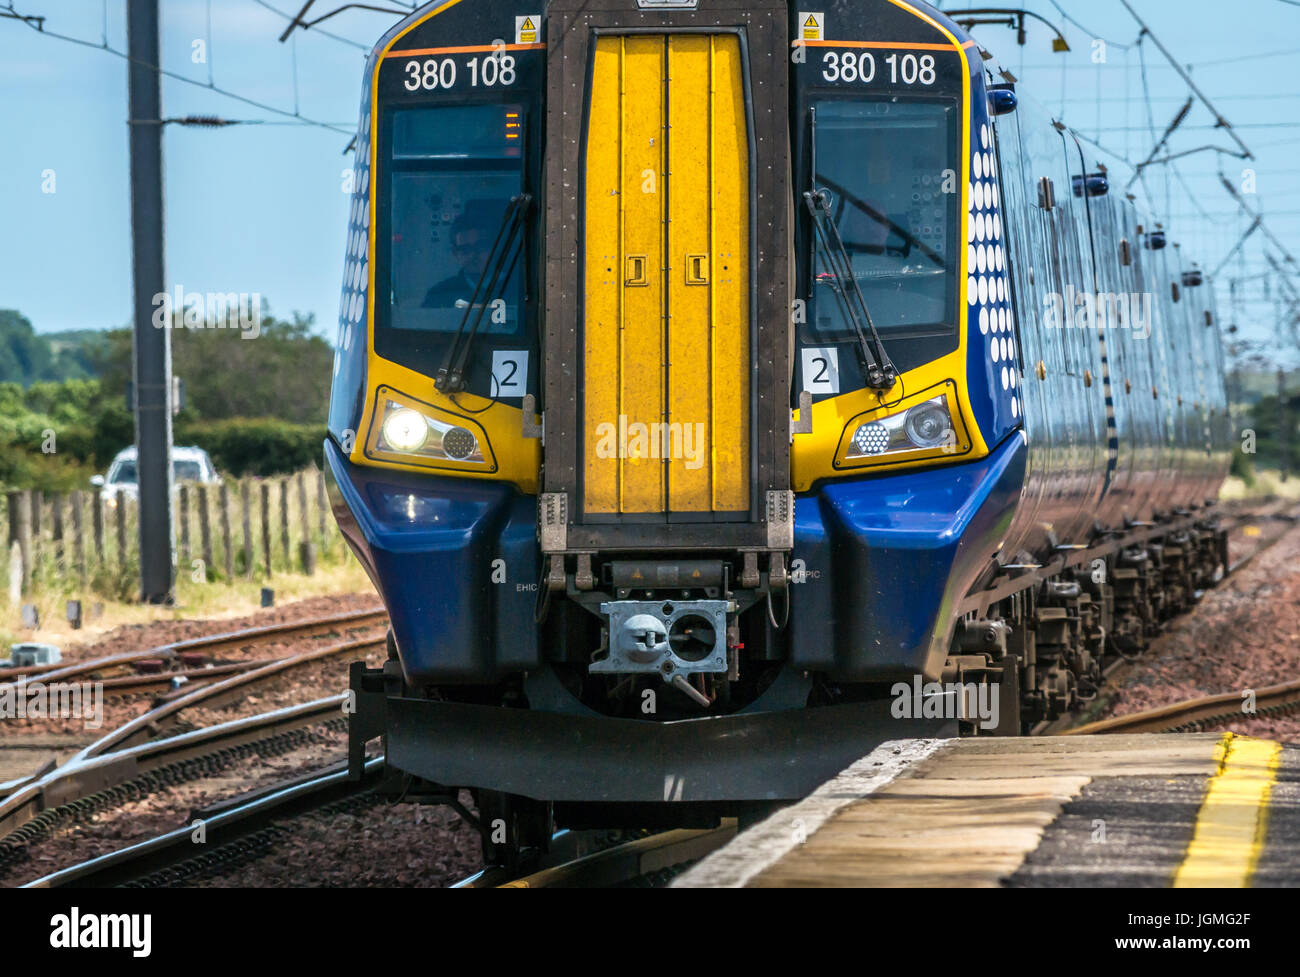 Close up of Scotrail train on North Berwick line approaching Drem train station, East Lothian, Scotland, UK - Stock Image